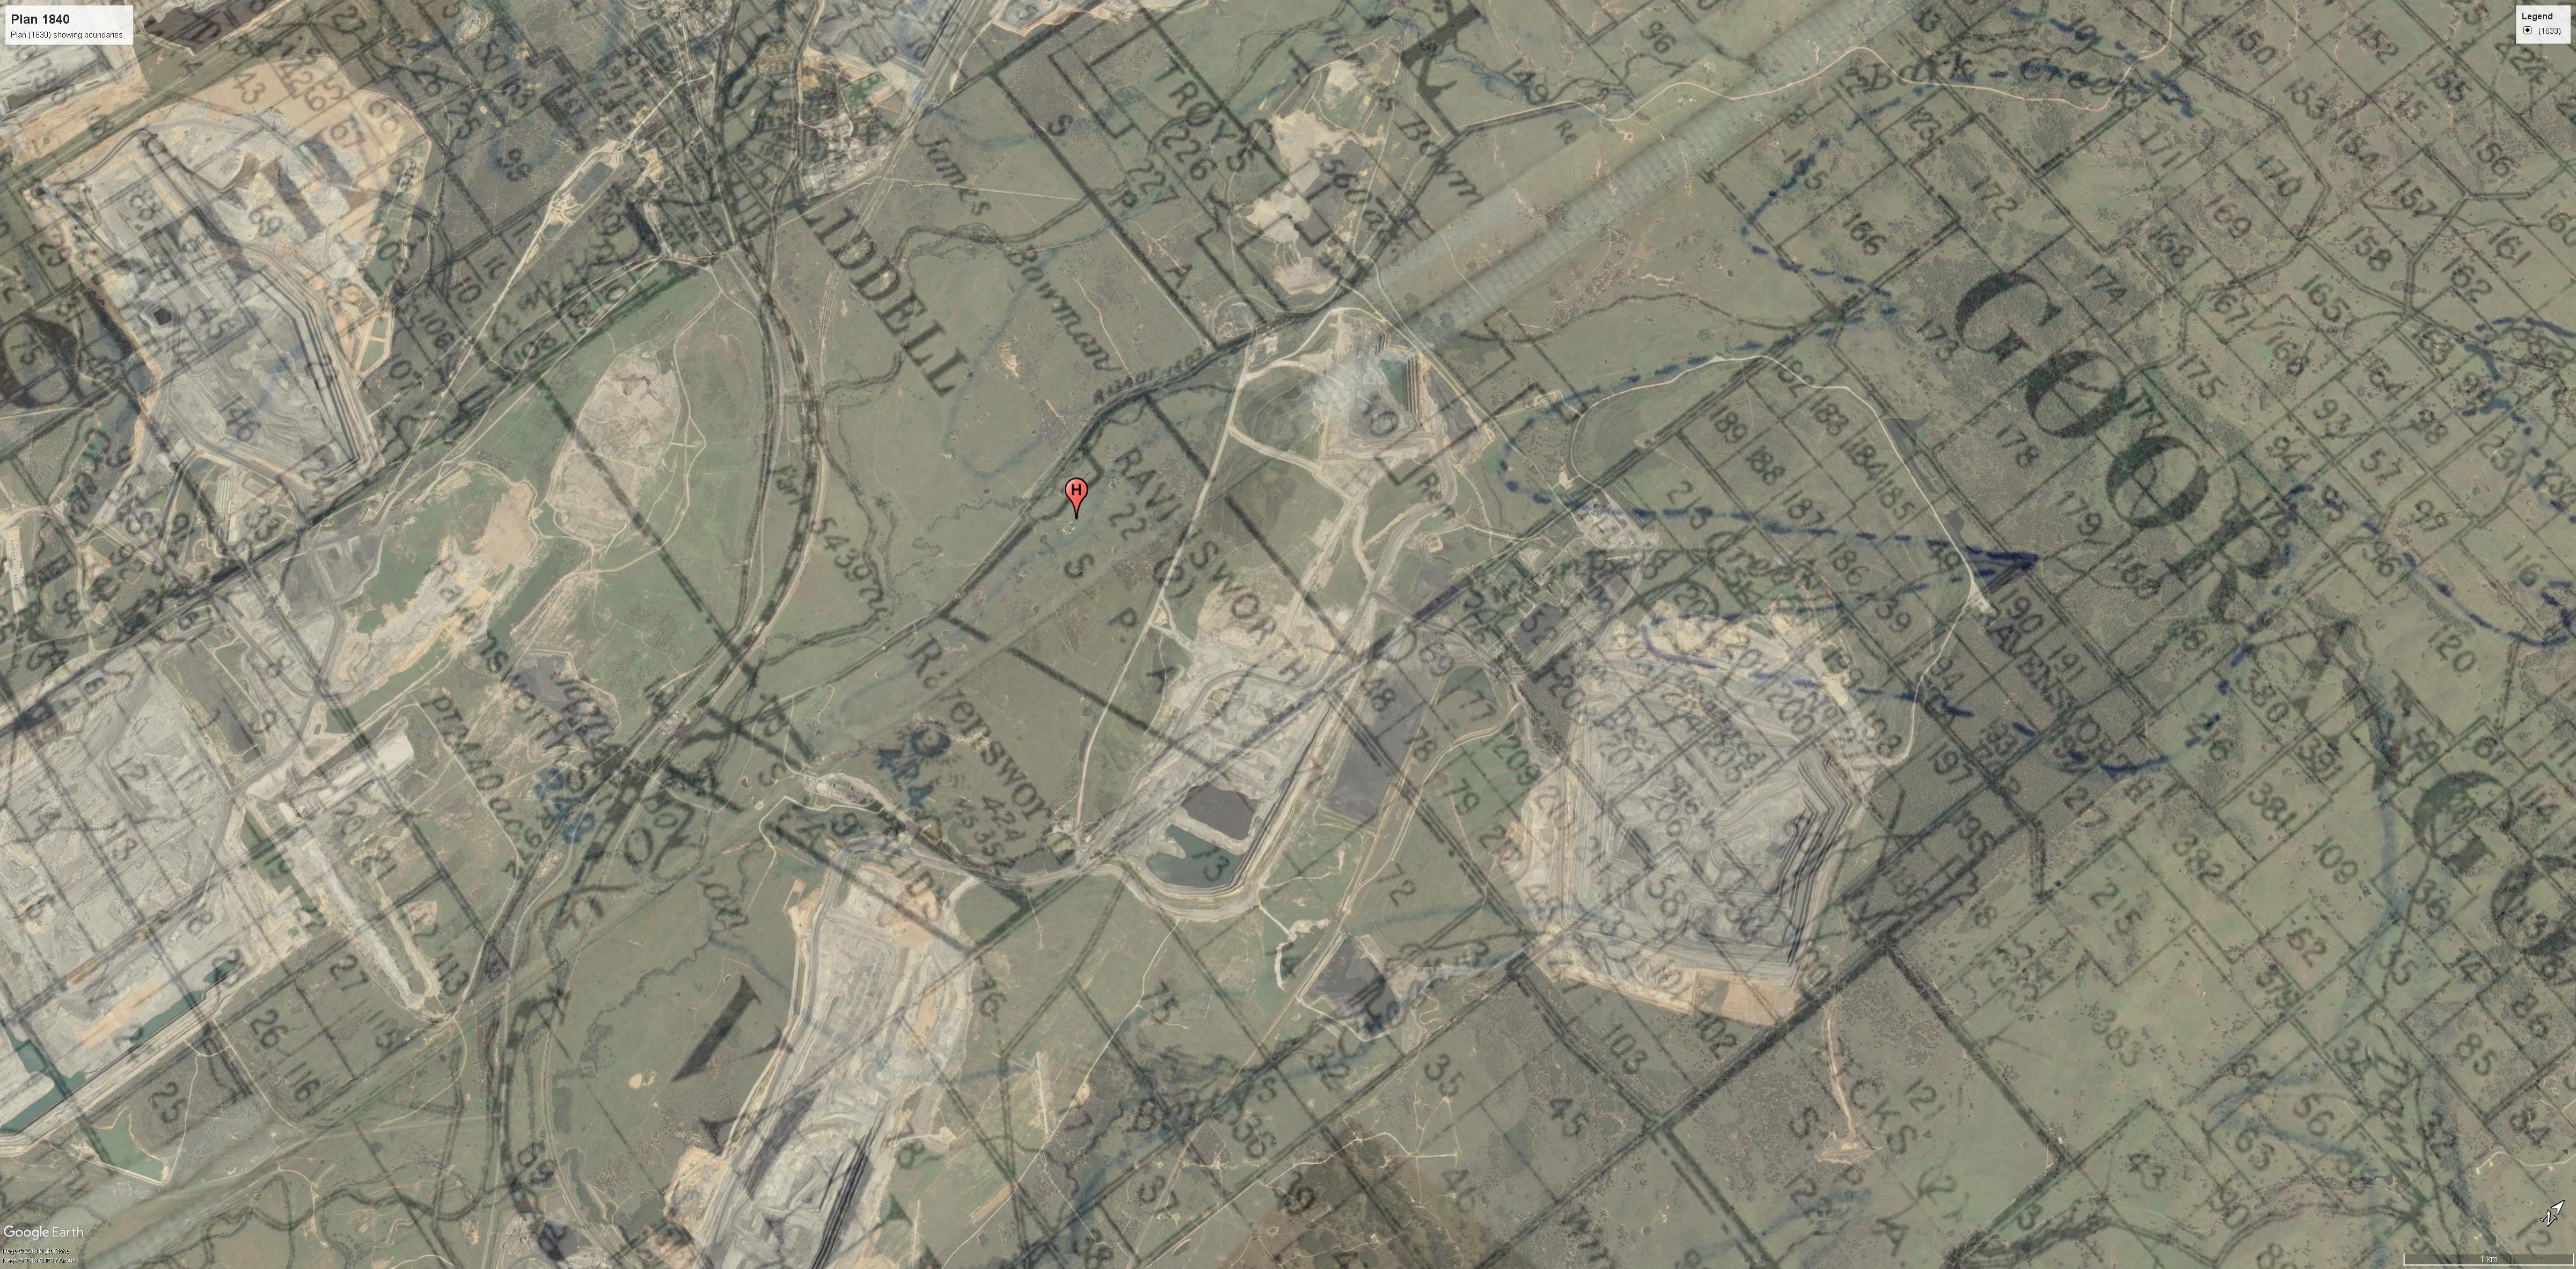 Ravensworth 1925- general location of Ravensworth homestead